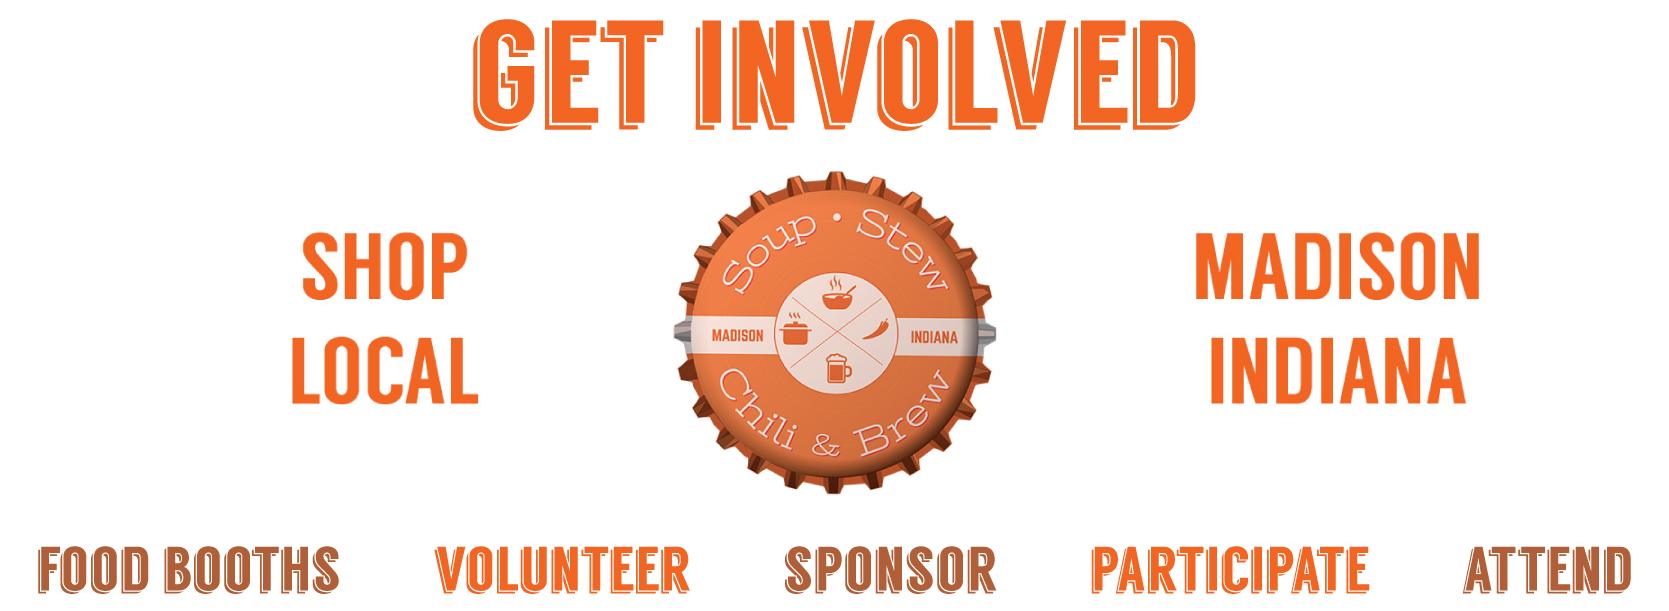 get-involved-button.jpg